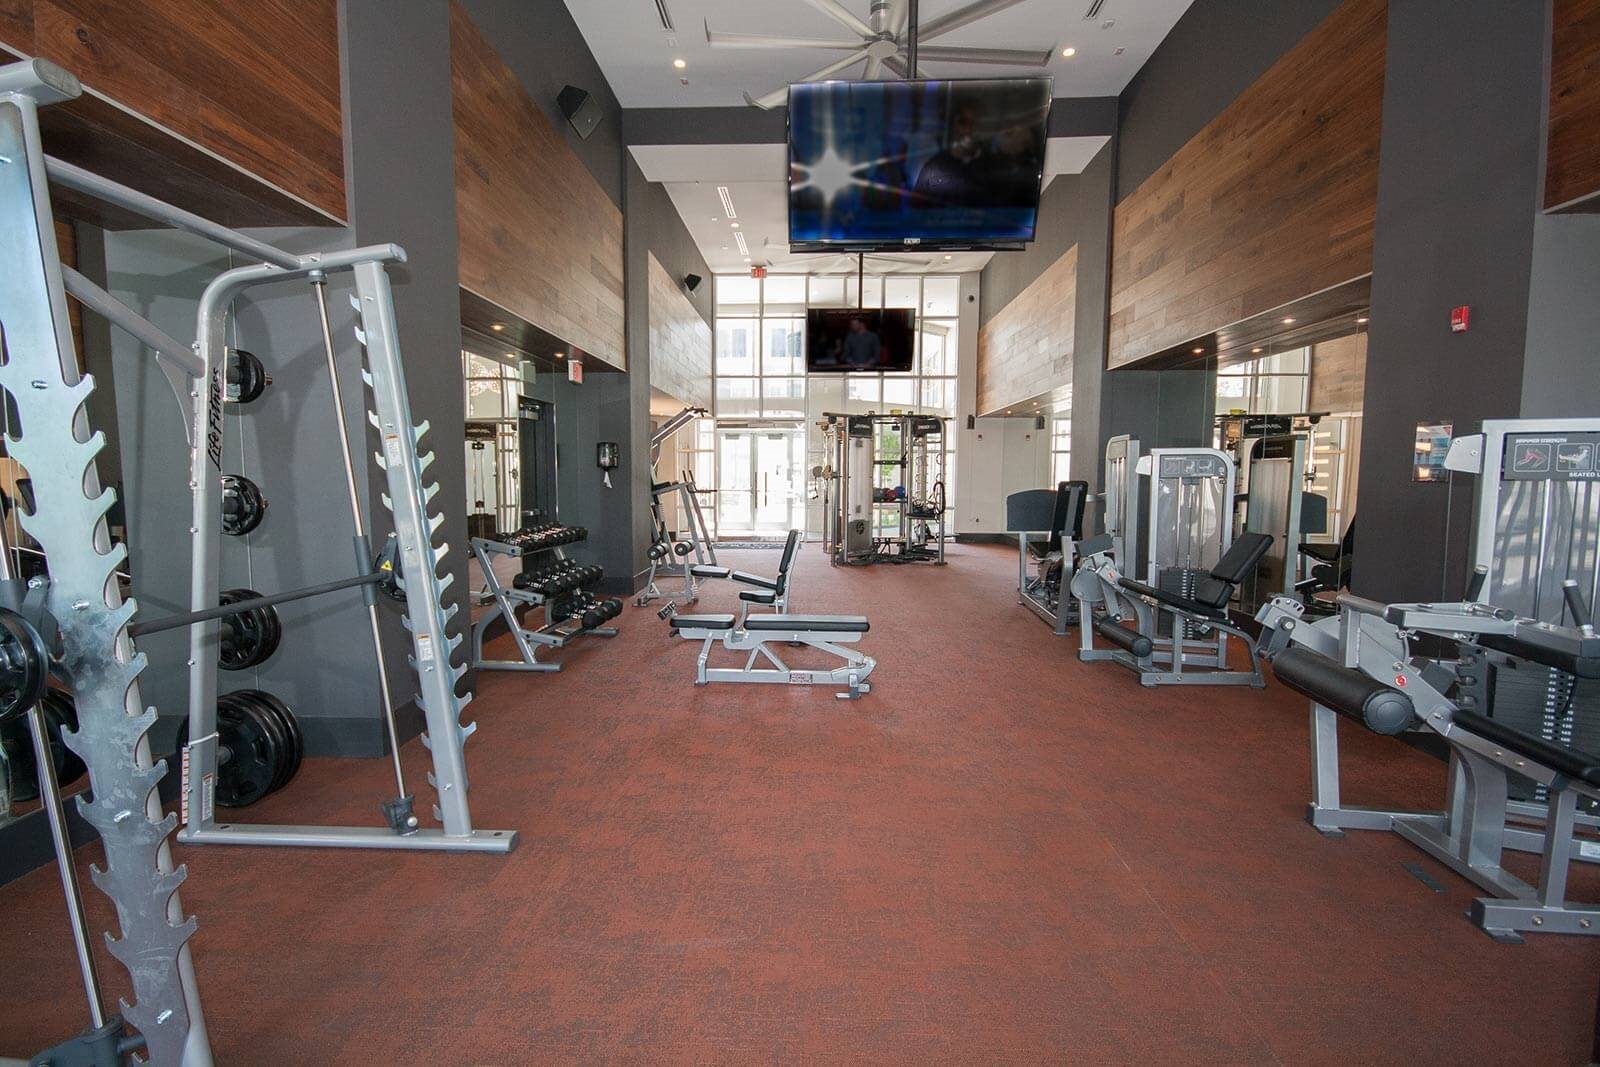 State-of-the-Art Fitness Center at Morningside Atlanta by Windsor, Atlanta, 30324